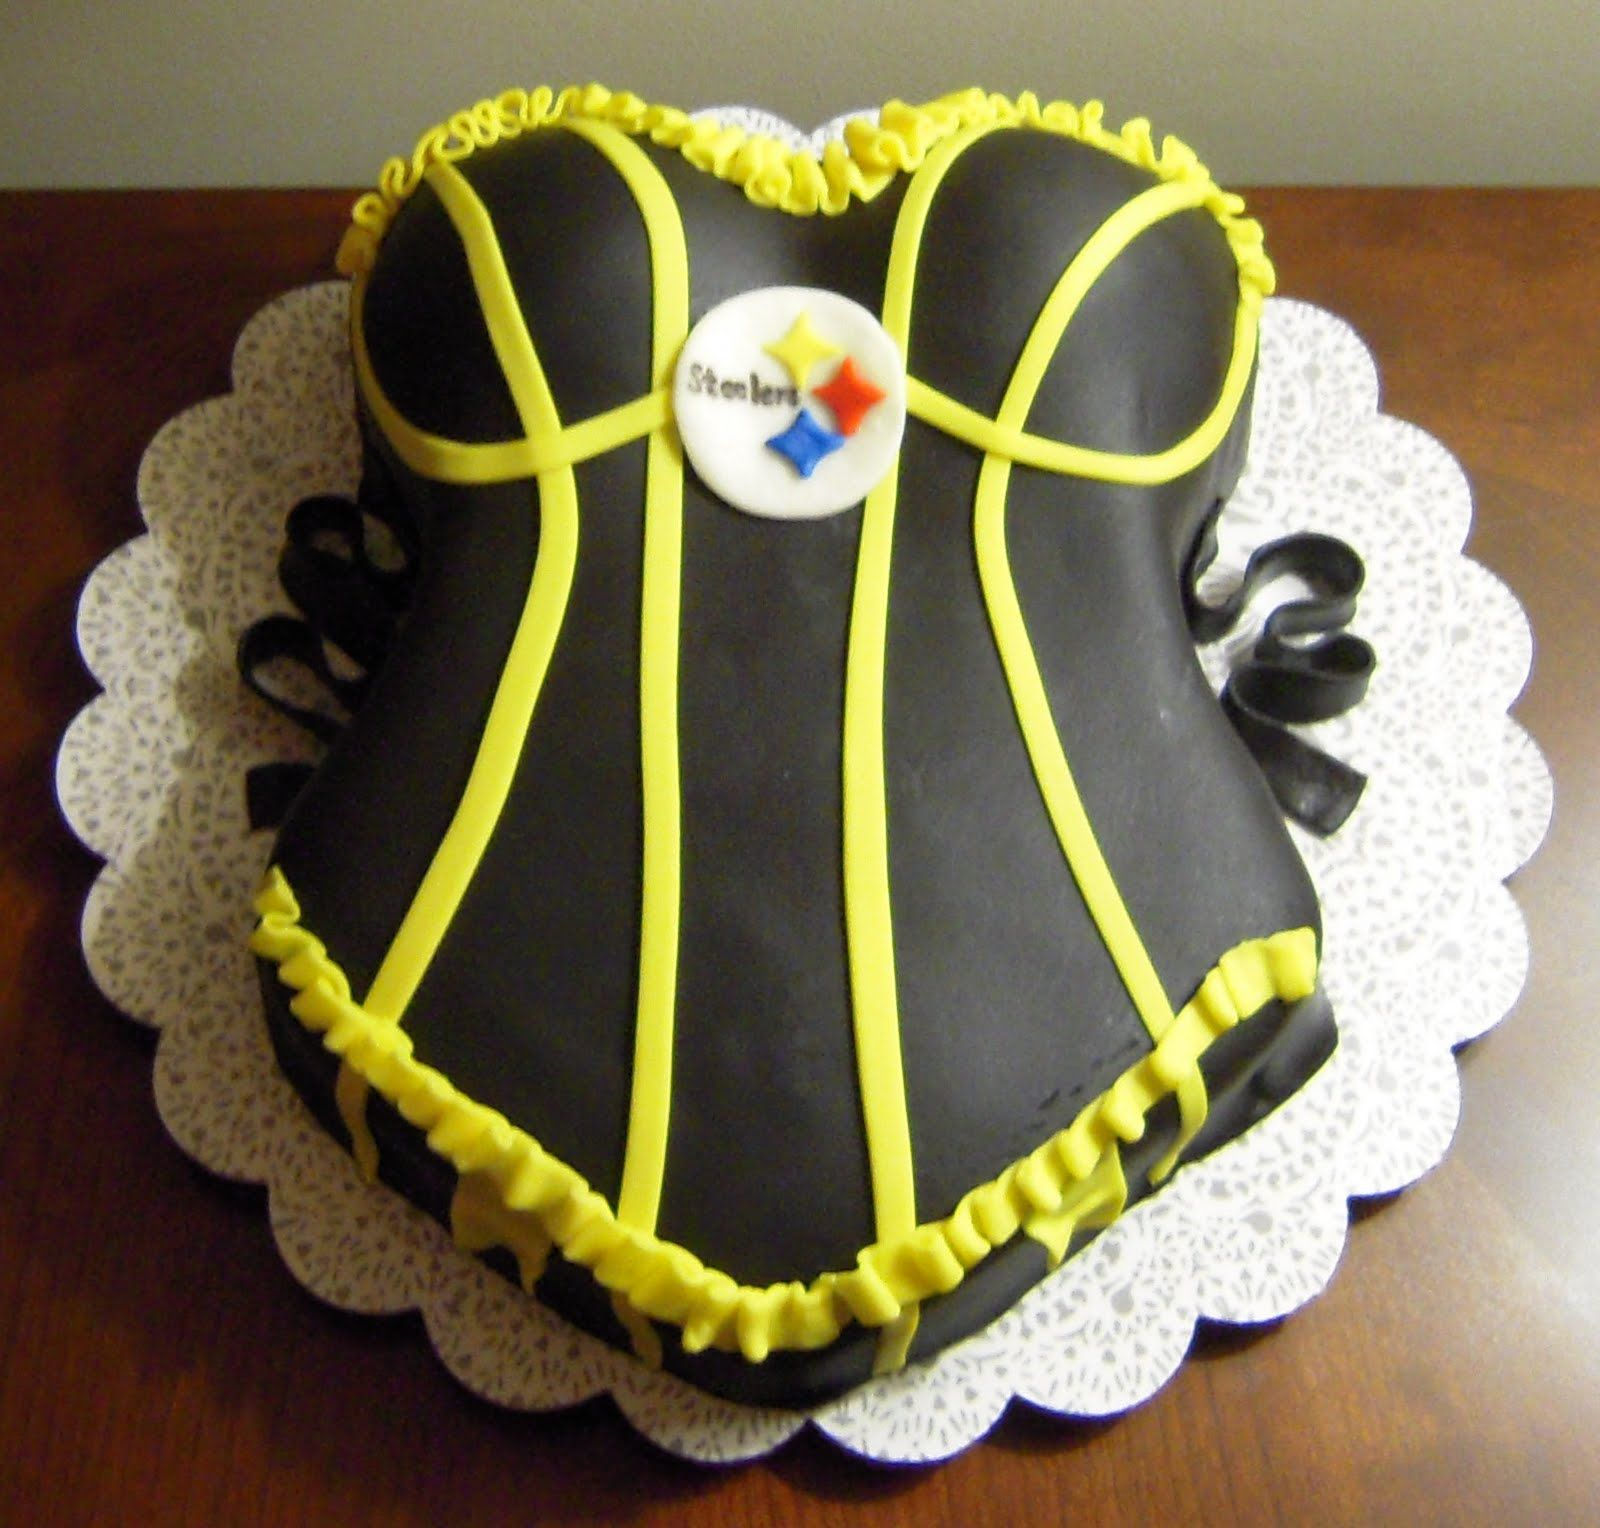 steelers cakes Bing Images cakes Pinterest Cake Man cake